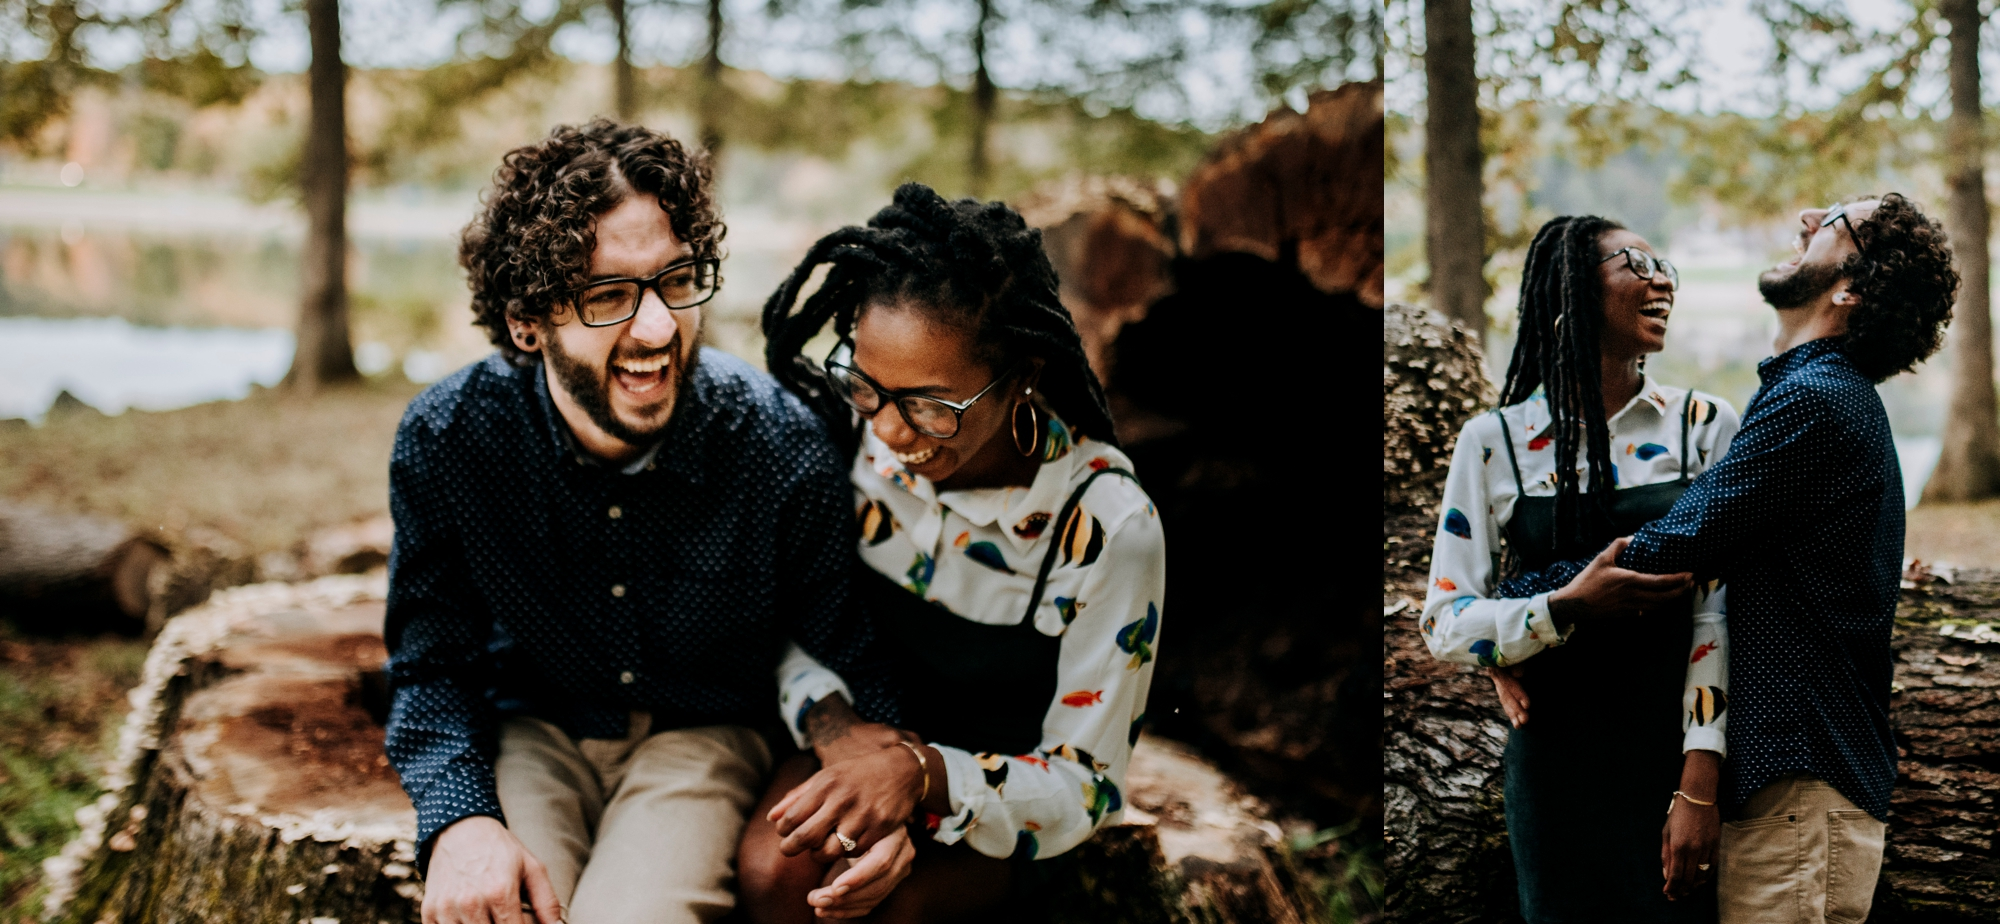 SCP_1274-AmberSteve-_Pittsburgh-engagement-photography-nature.jpg